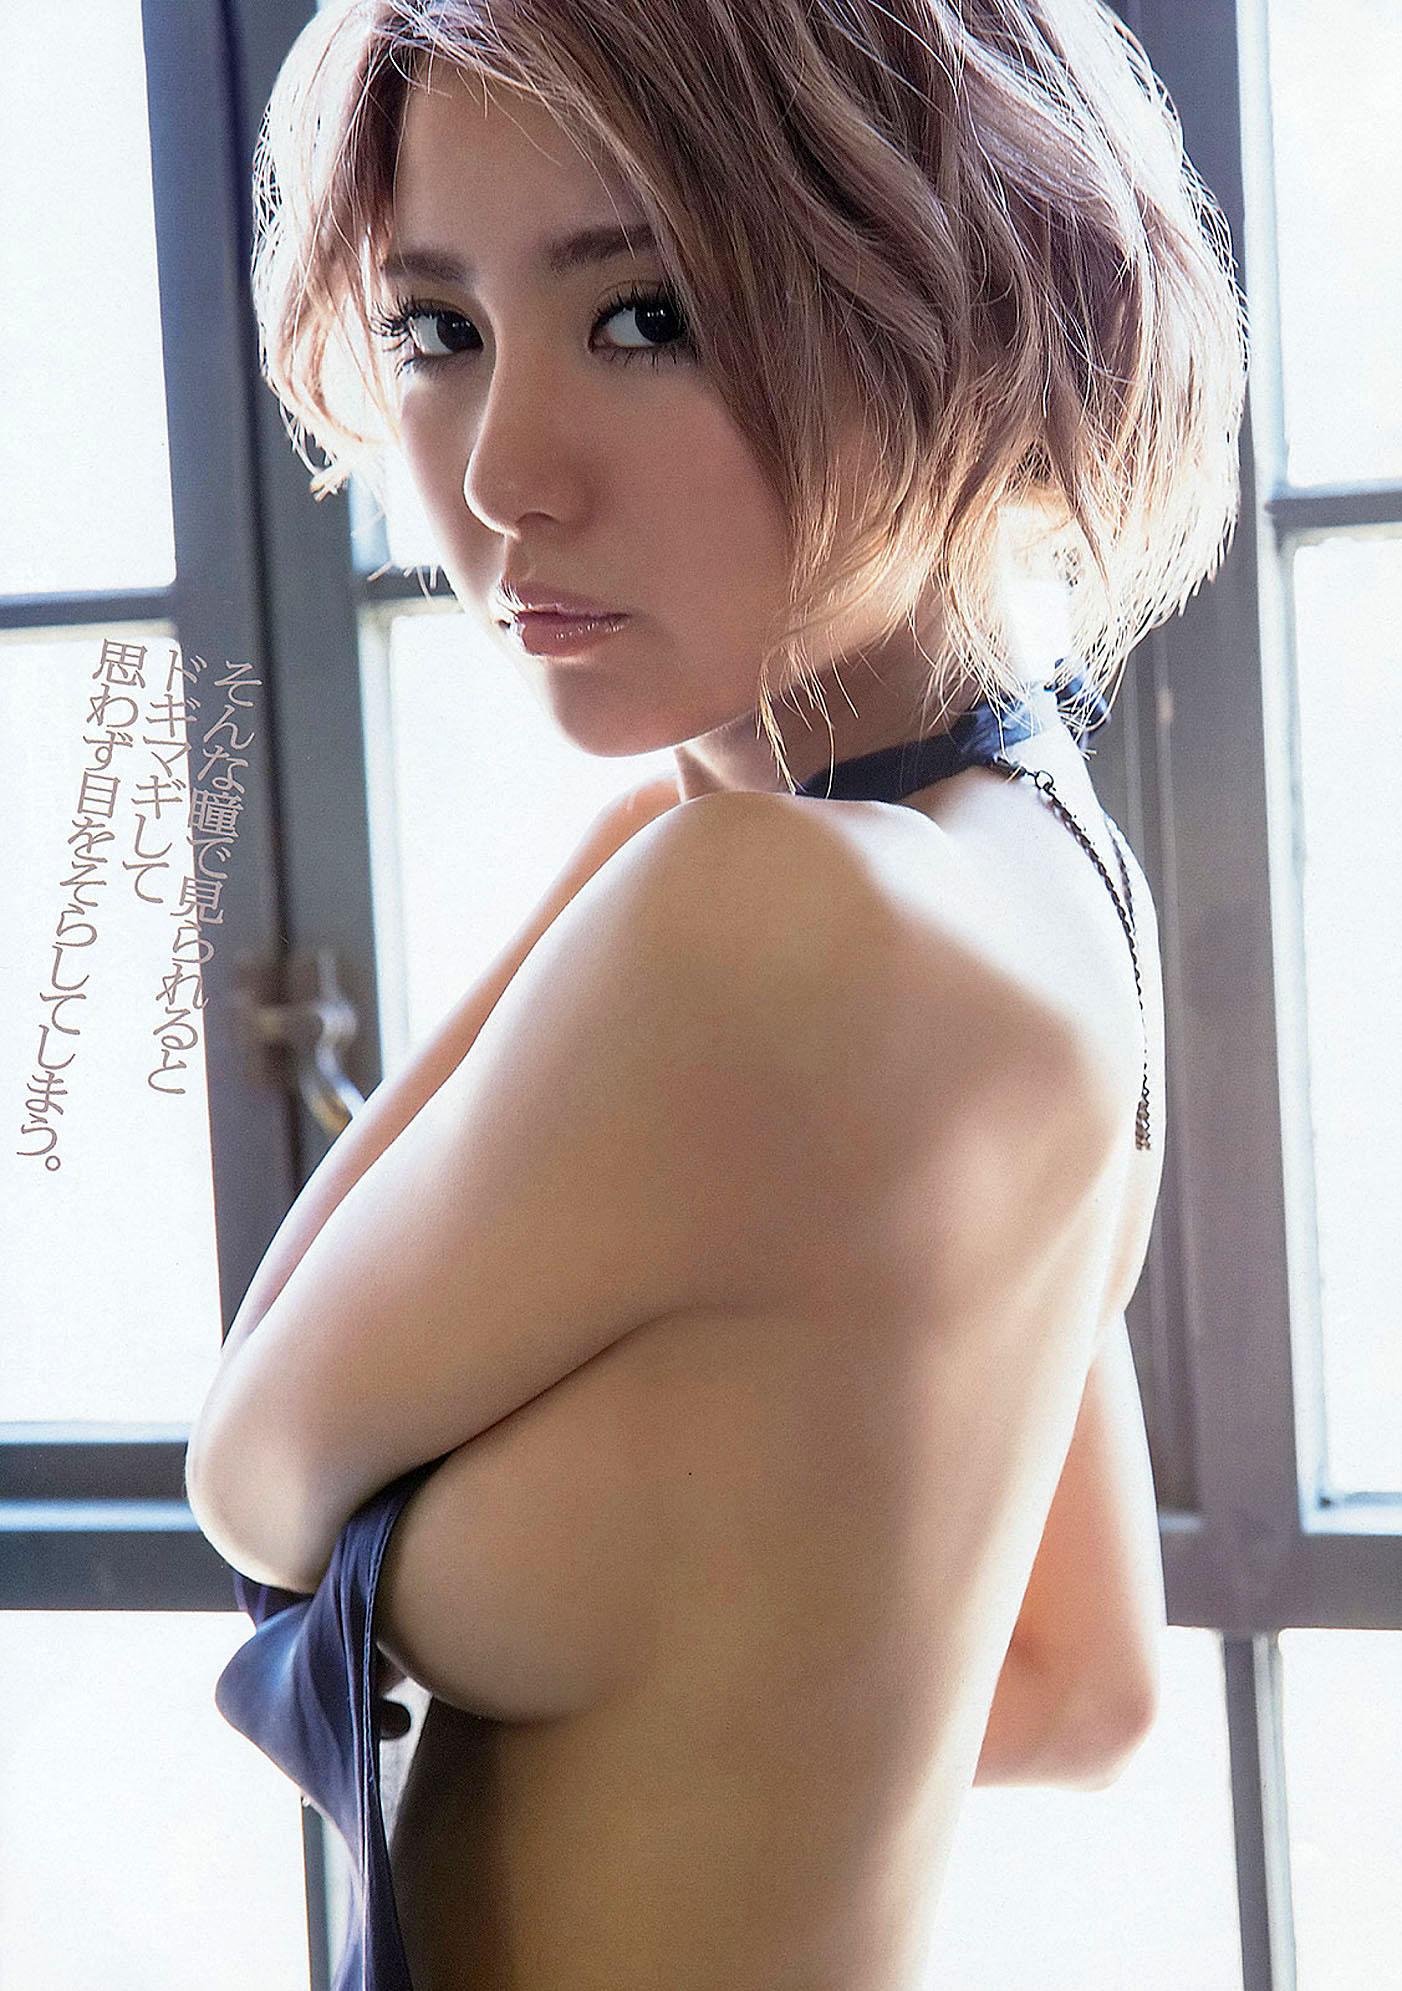 Ren Ishikawa Young Animal 141114 03.jpg